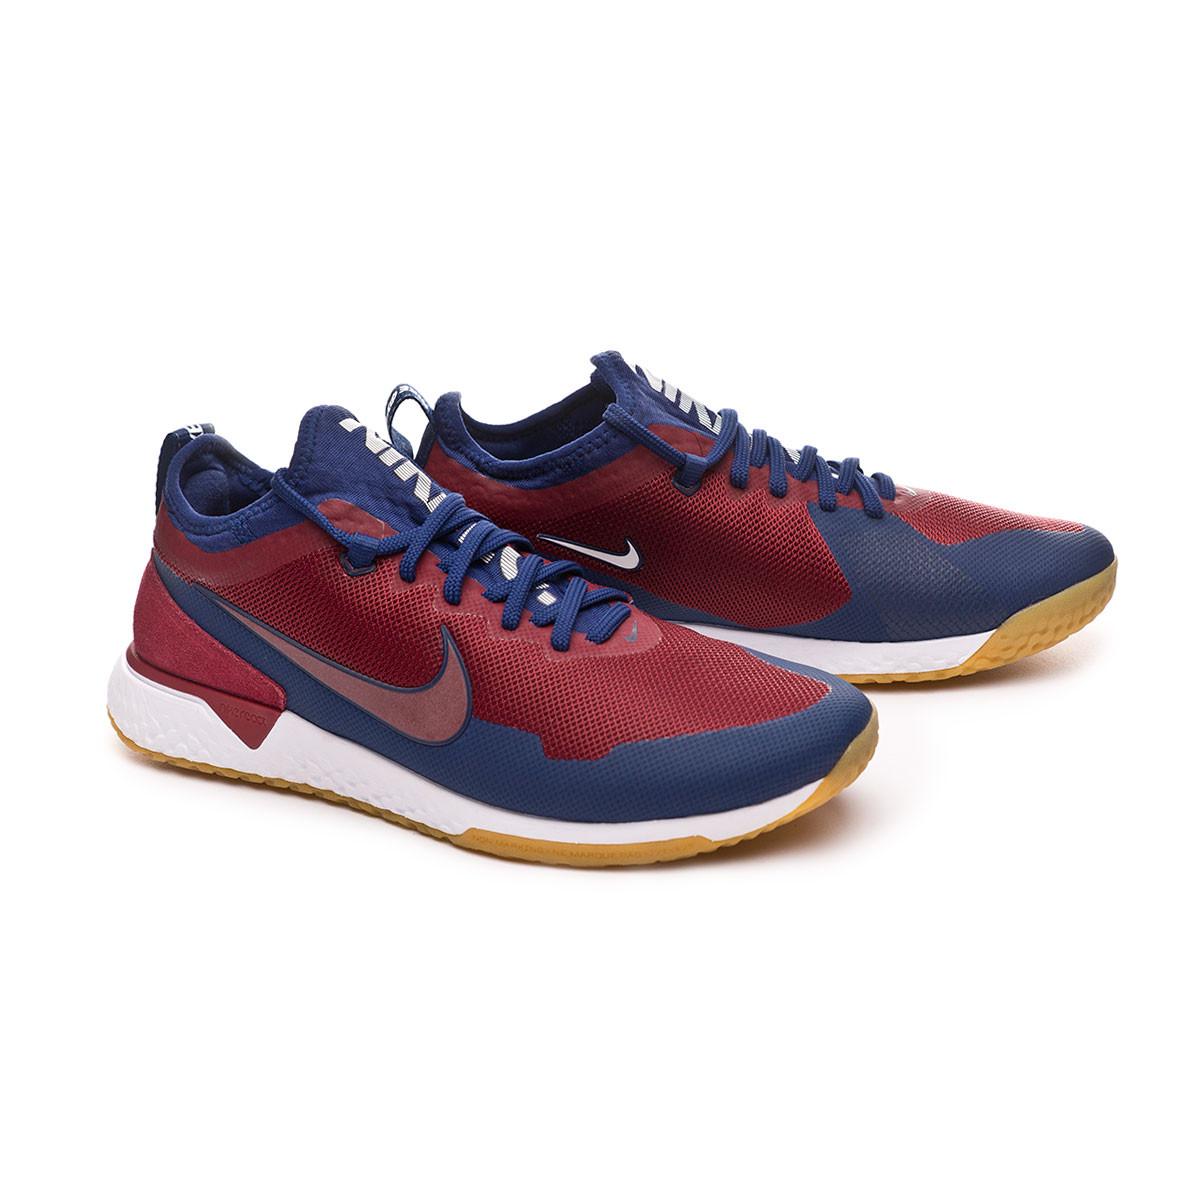 59722046f373 Tenis Nike Nike F.C. Team red-White-Blue void-Gum light brown -  Soloporteros es ahora Fútbol Emotion